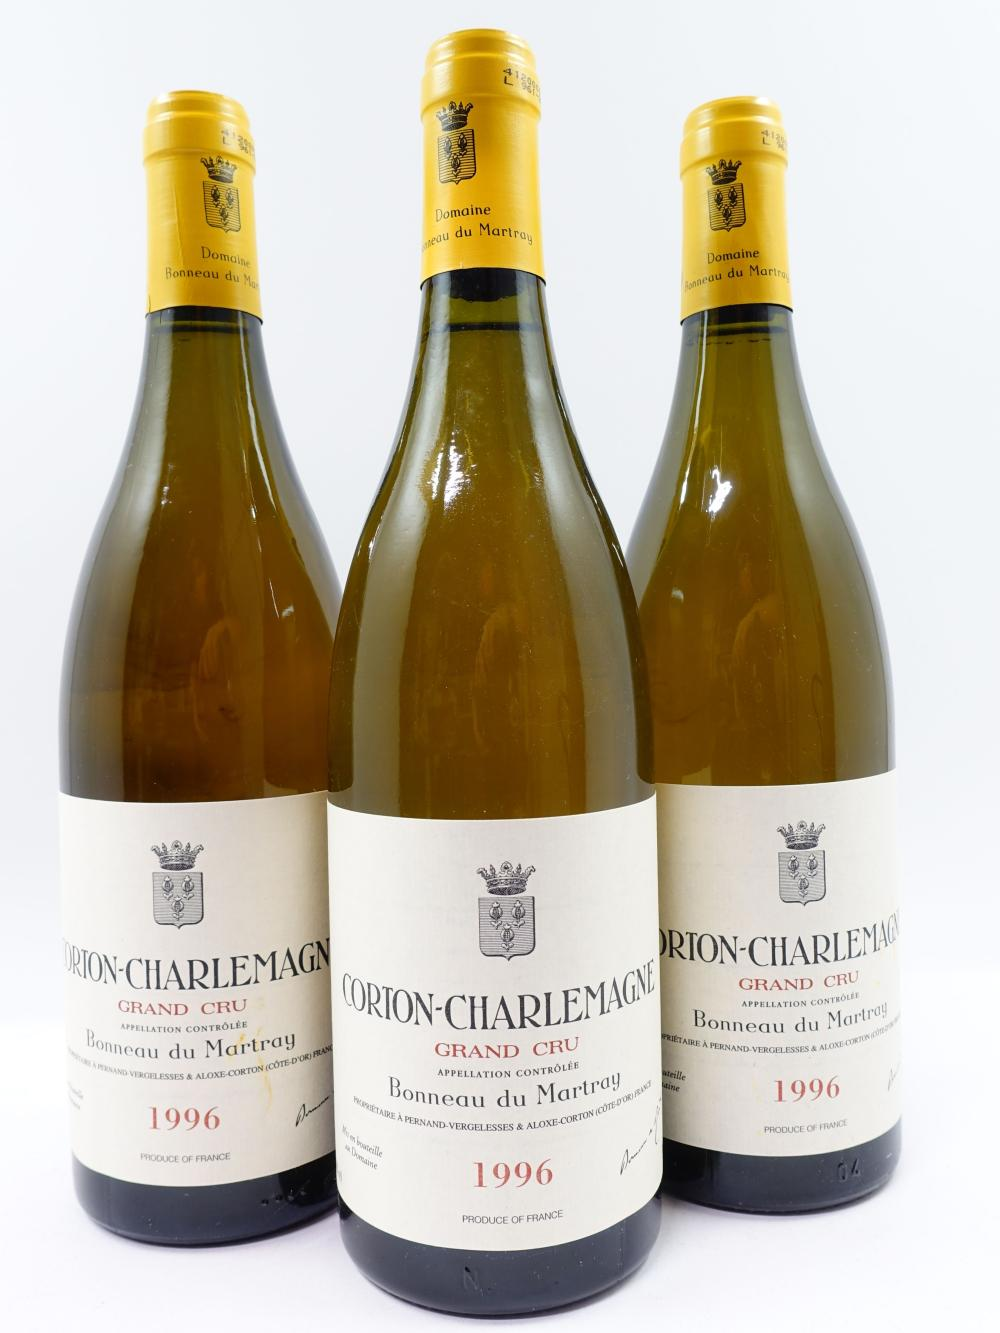 3 bouteilles CORTON CHARLEMAGNE 1996 Grand Cru